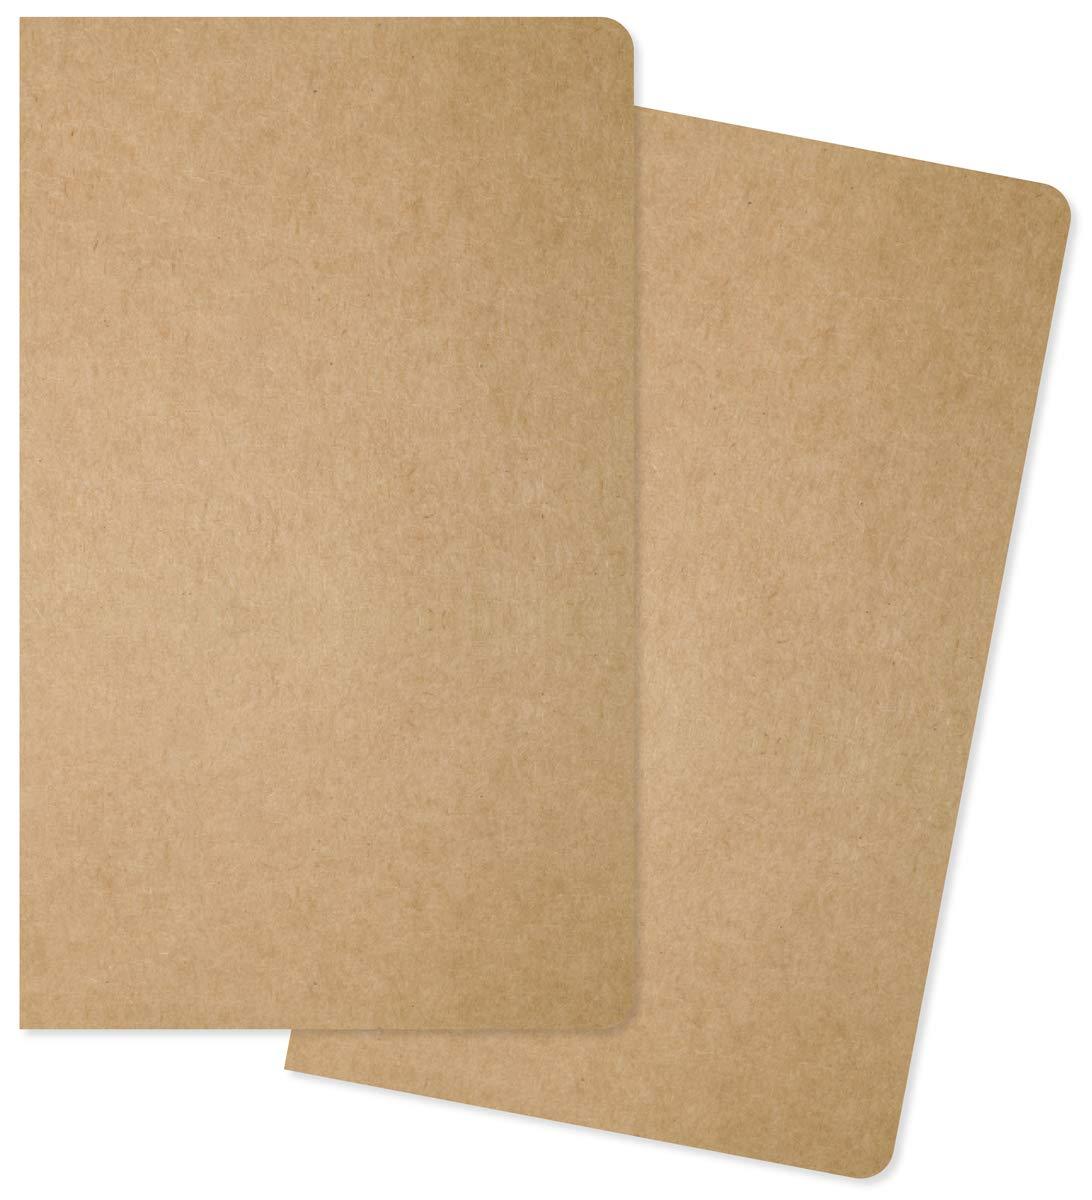 Carpe Diem Traveler's Notebook Insert Simple Stories TN Planner Refill, Pack of 2 (10205)